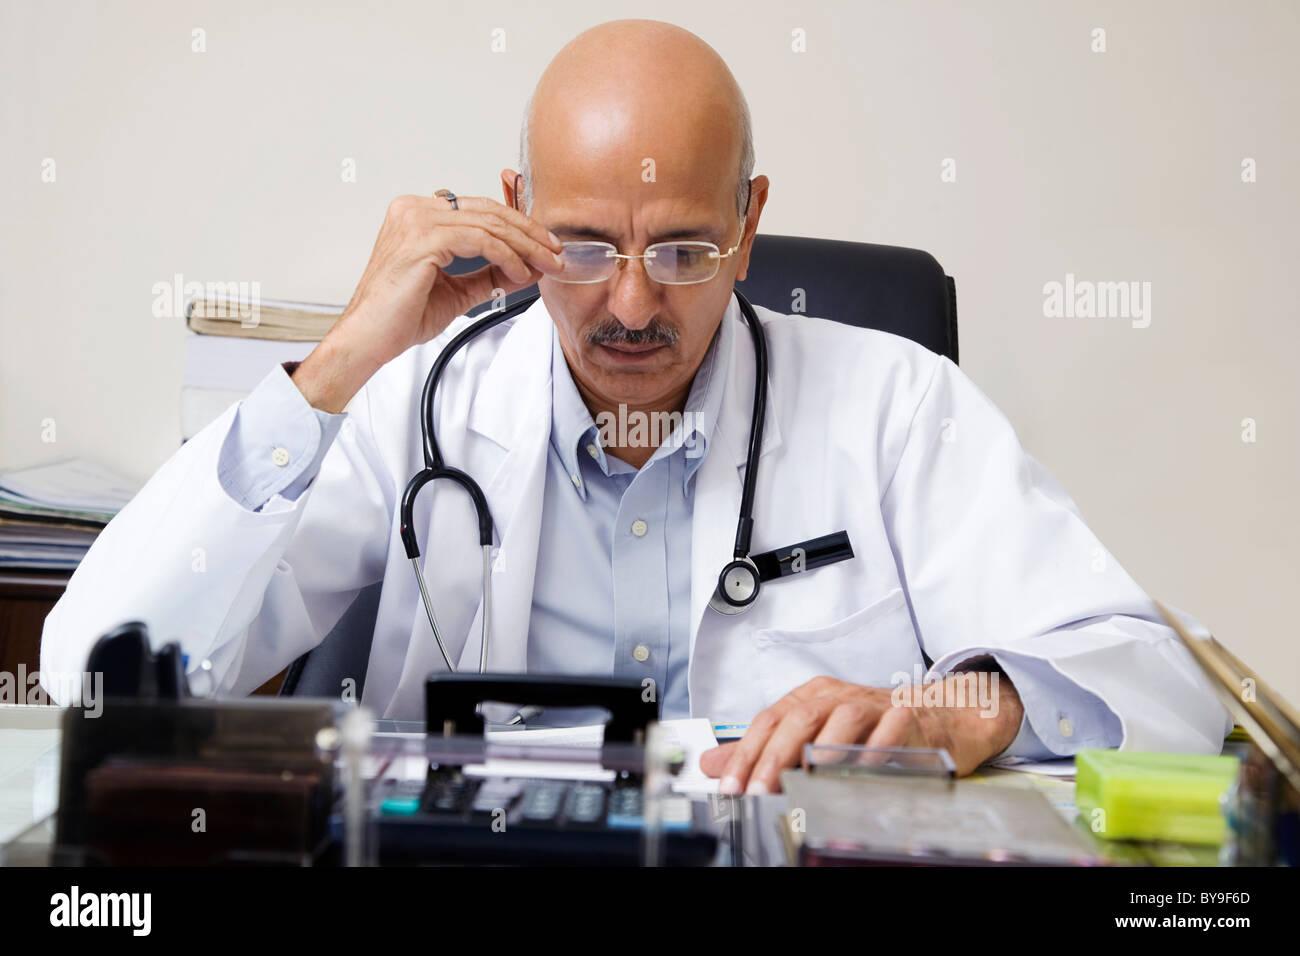 Arzt einen Bericht Stockbild